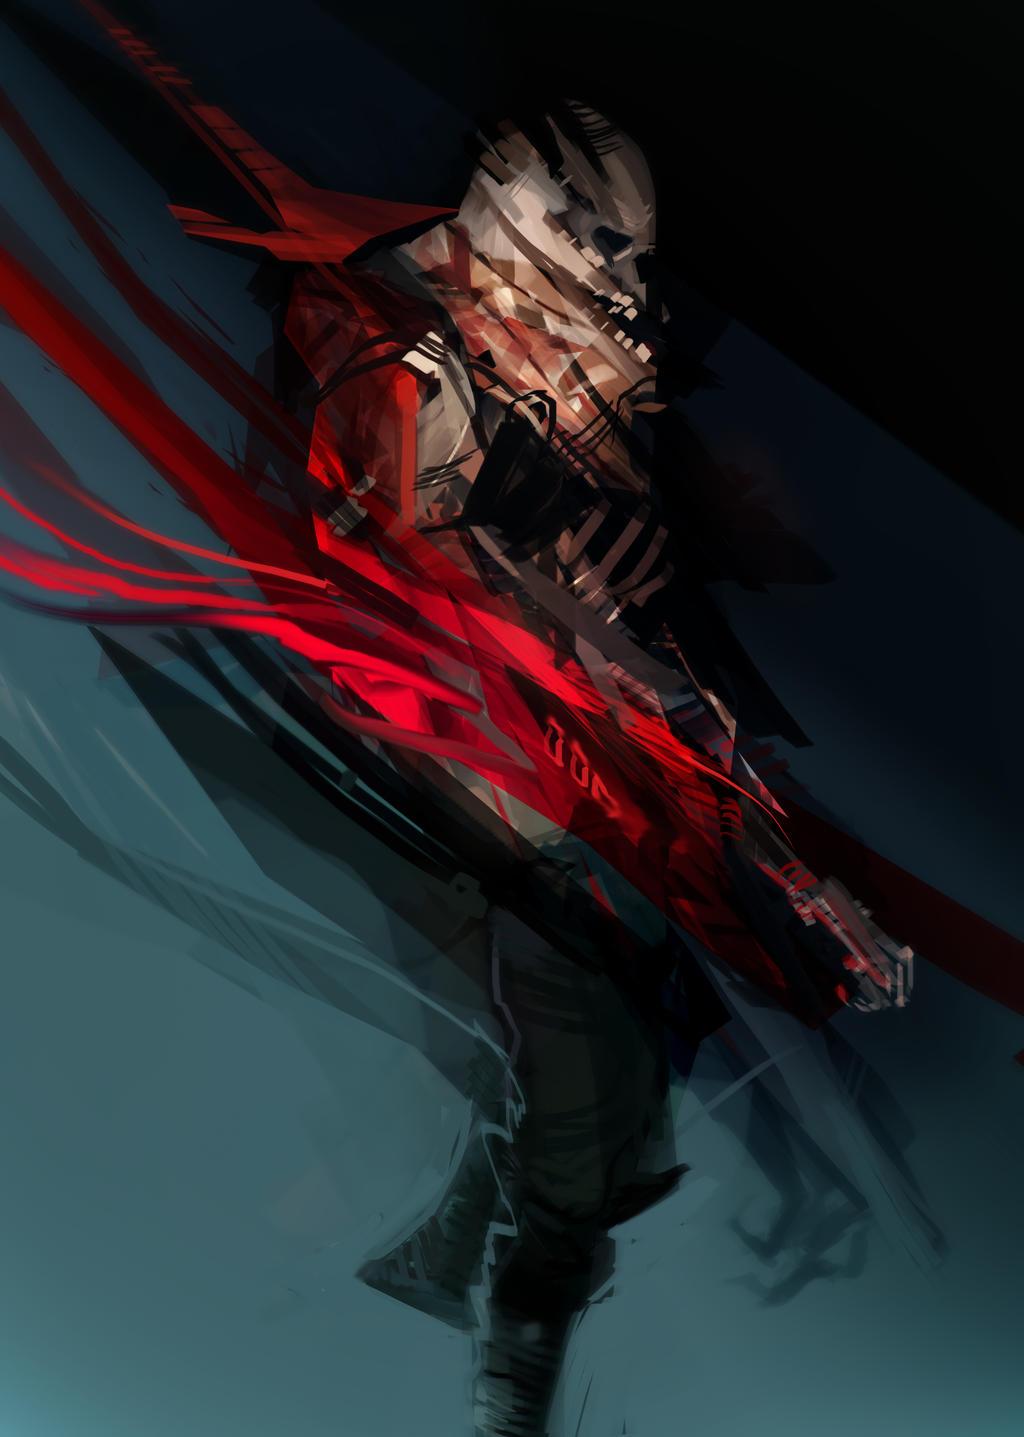 skullar abstractus - red + cyan by scrawlac